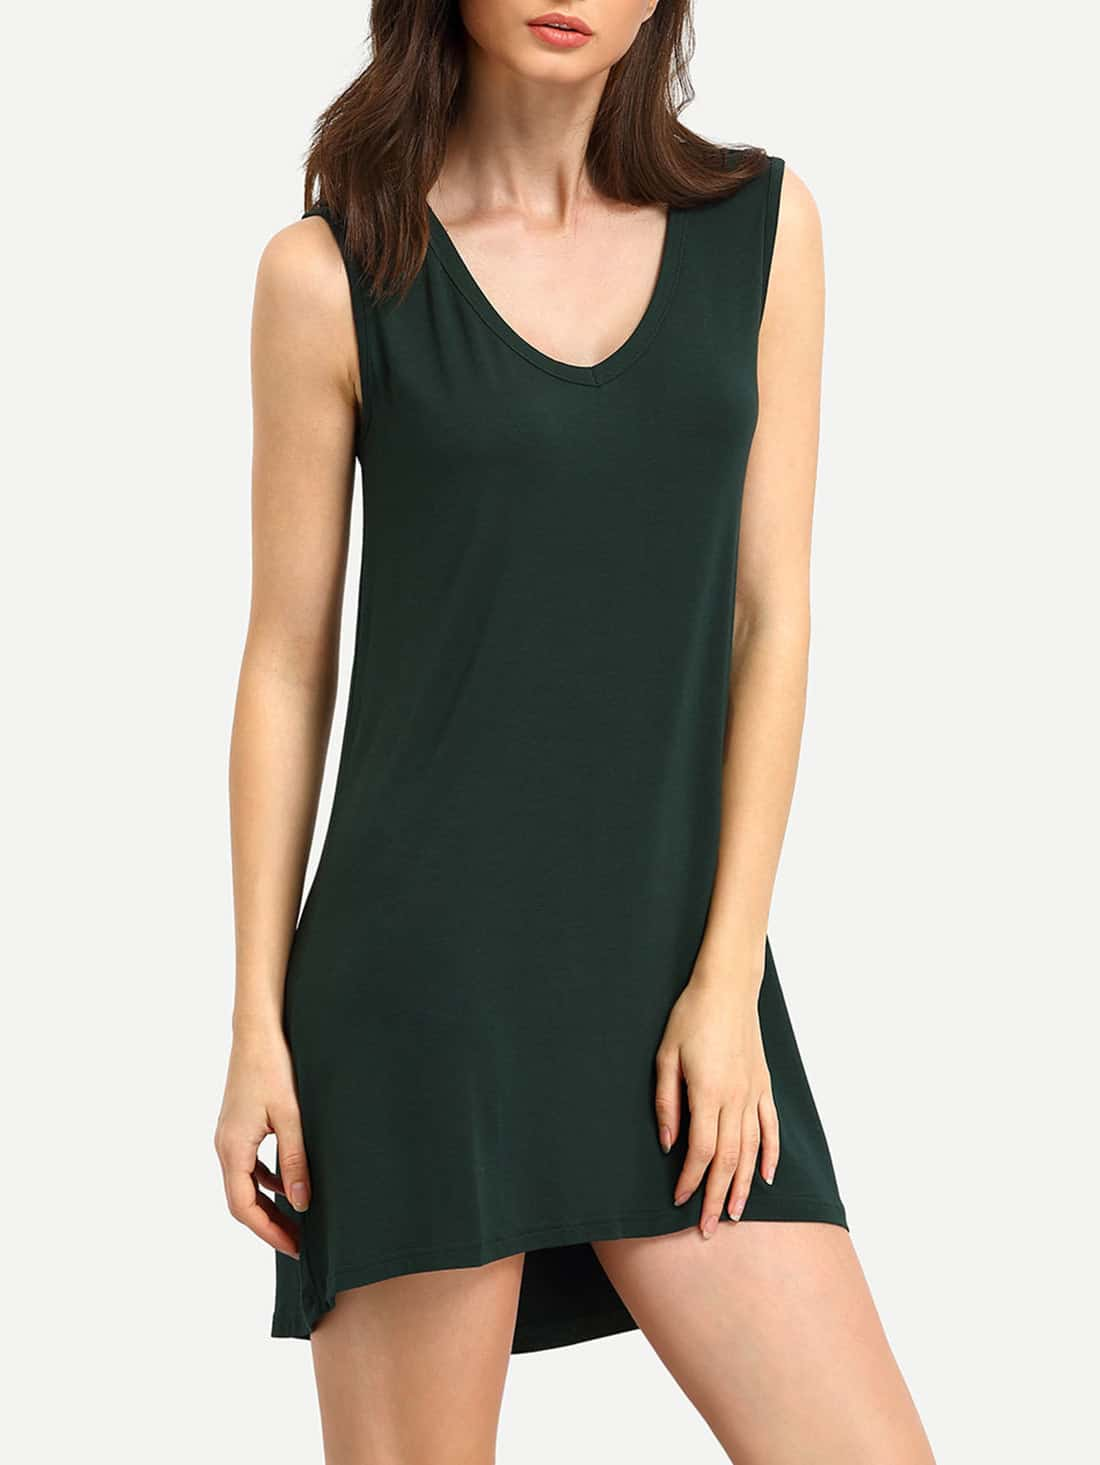 Green Minis Sleeveless Vest Casual Dress dress150825505